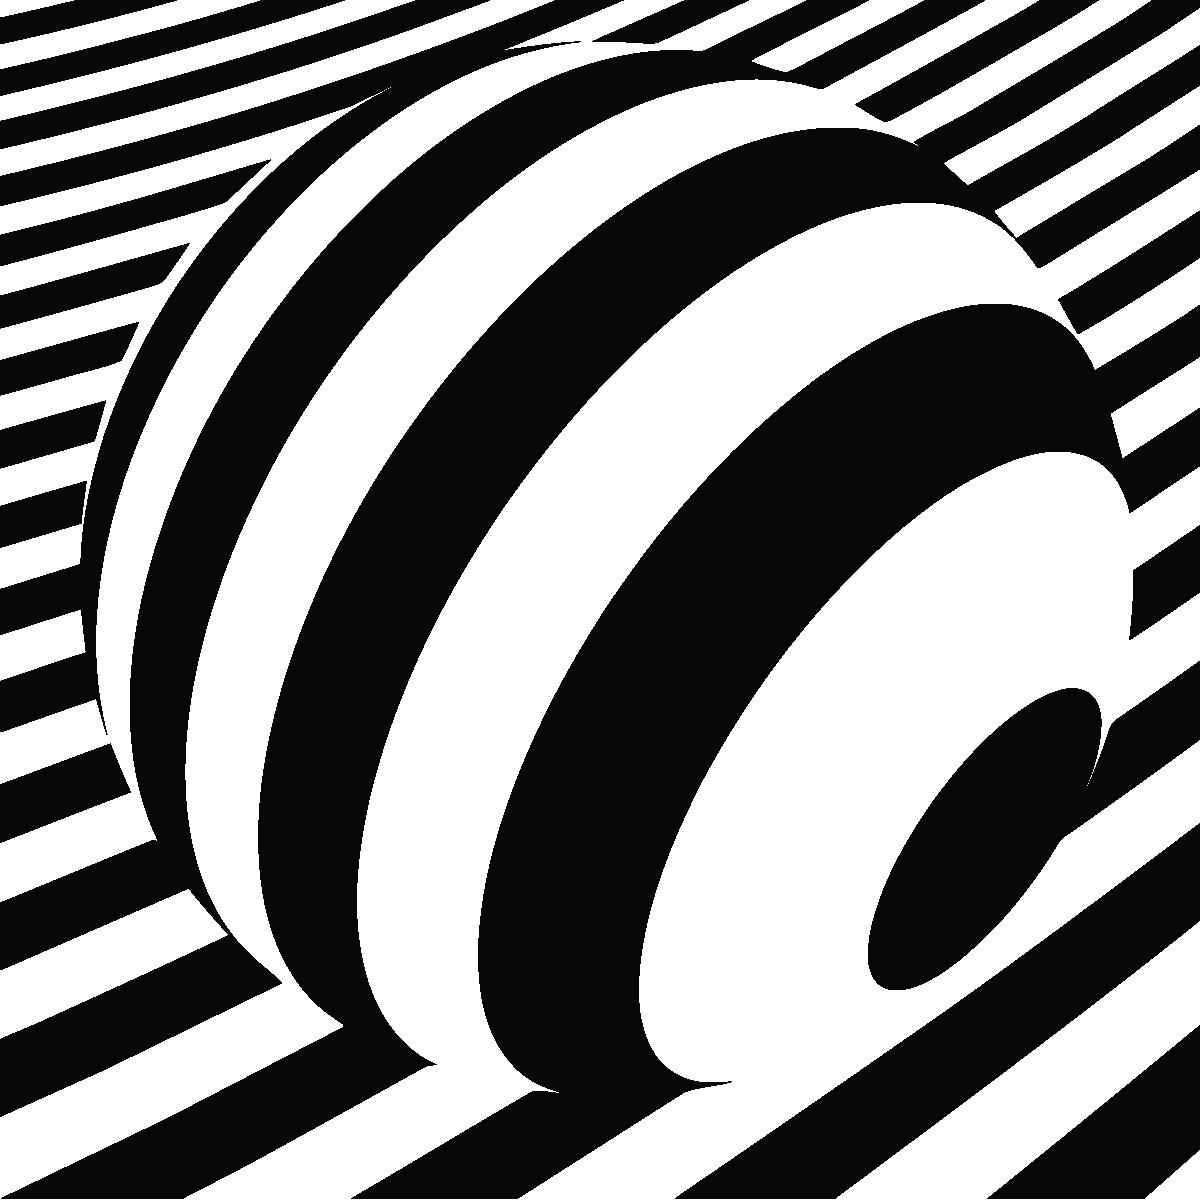 stickers muraux design sticker mural illusion d 39 optique 2 ambiance. Black Bedroom Furniture Sets. Home Design Ideas